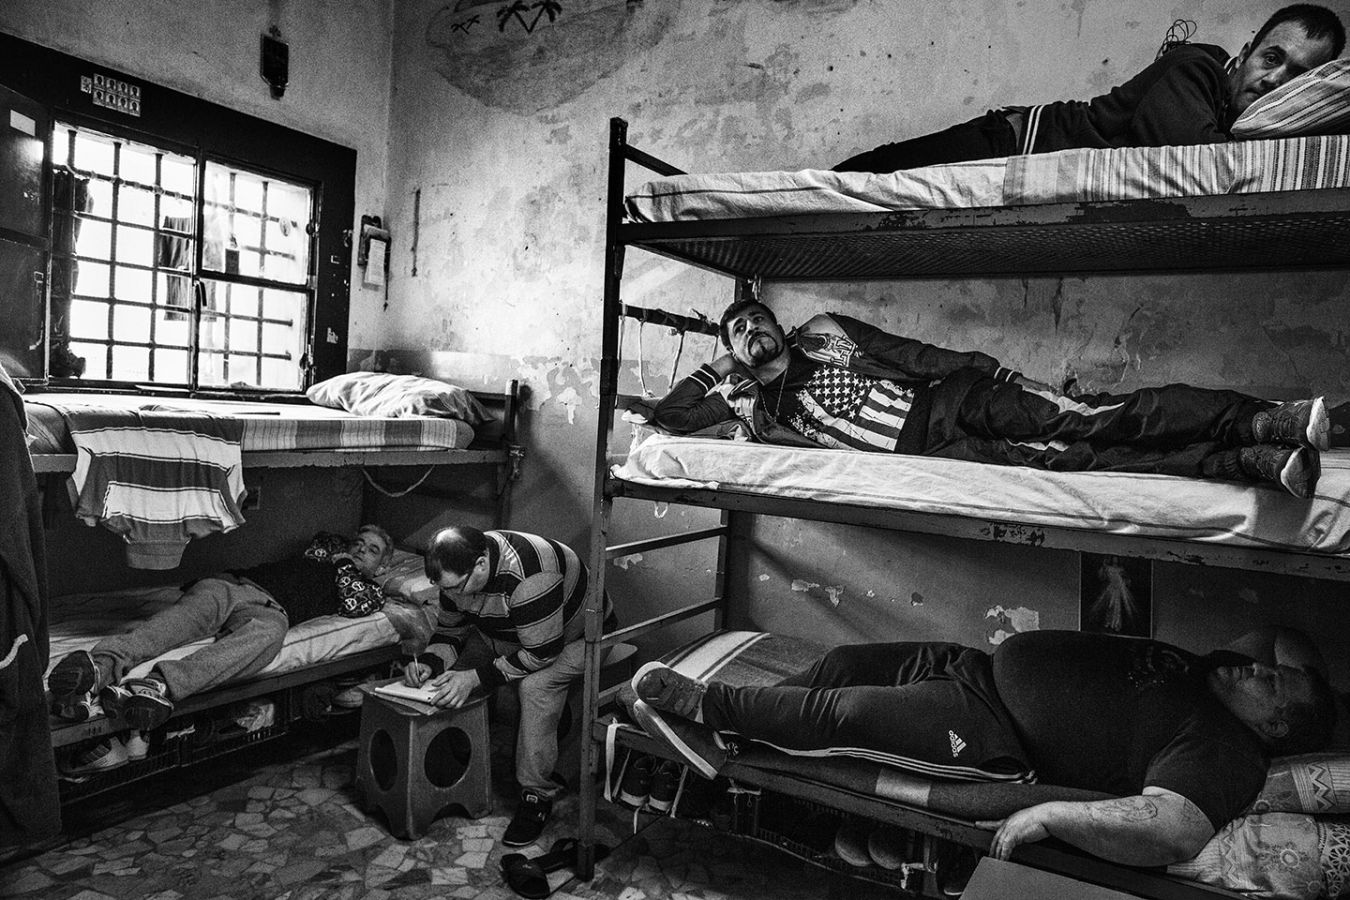 Камеры тюрьмы Поджиореэле Неаполя, 9 октября 2019 г.